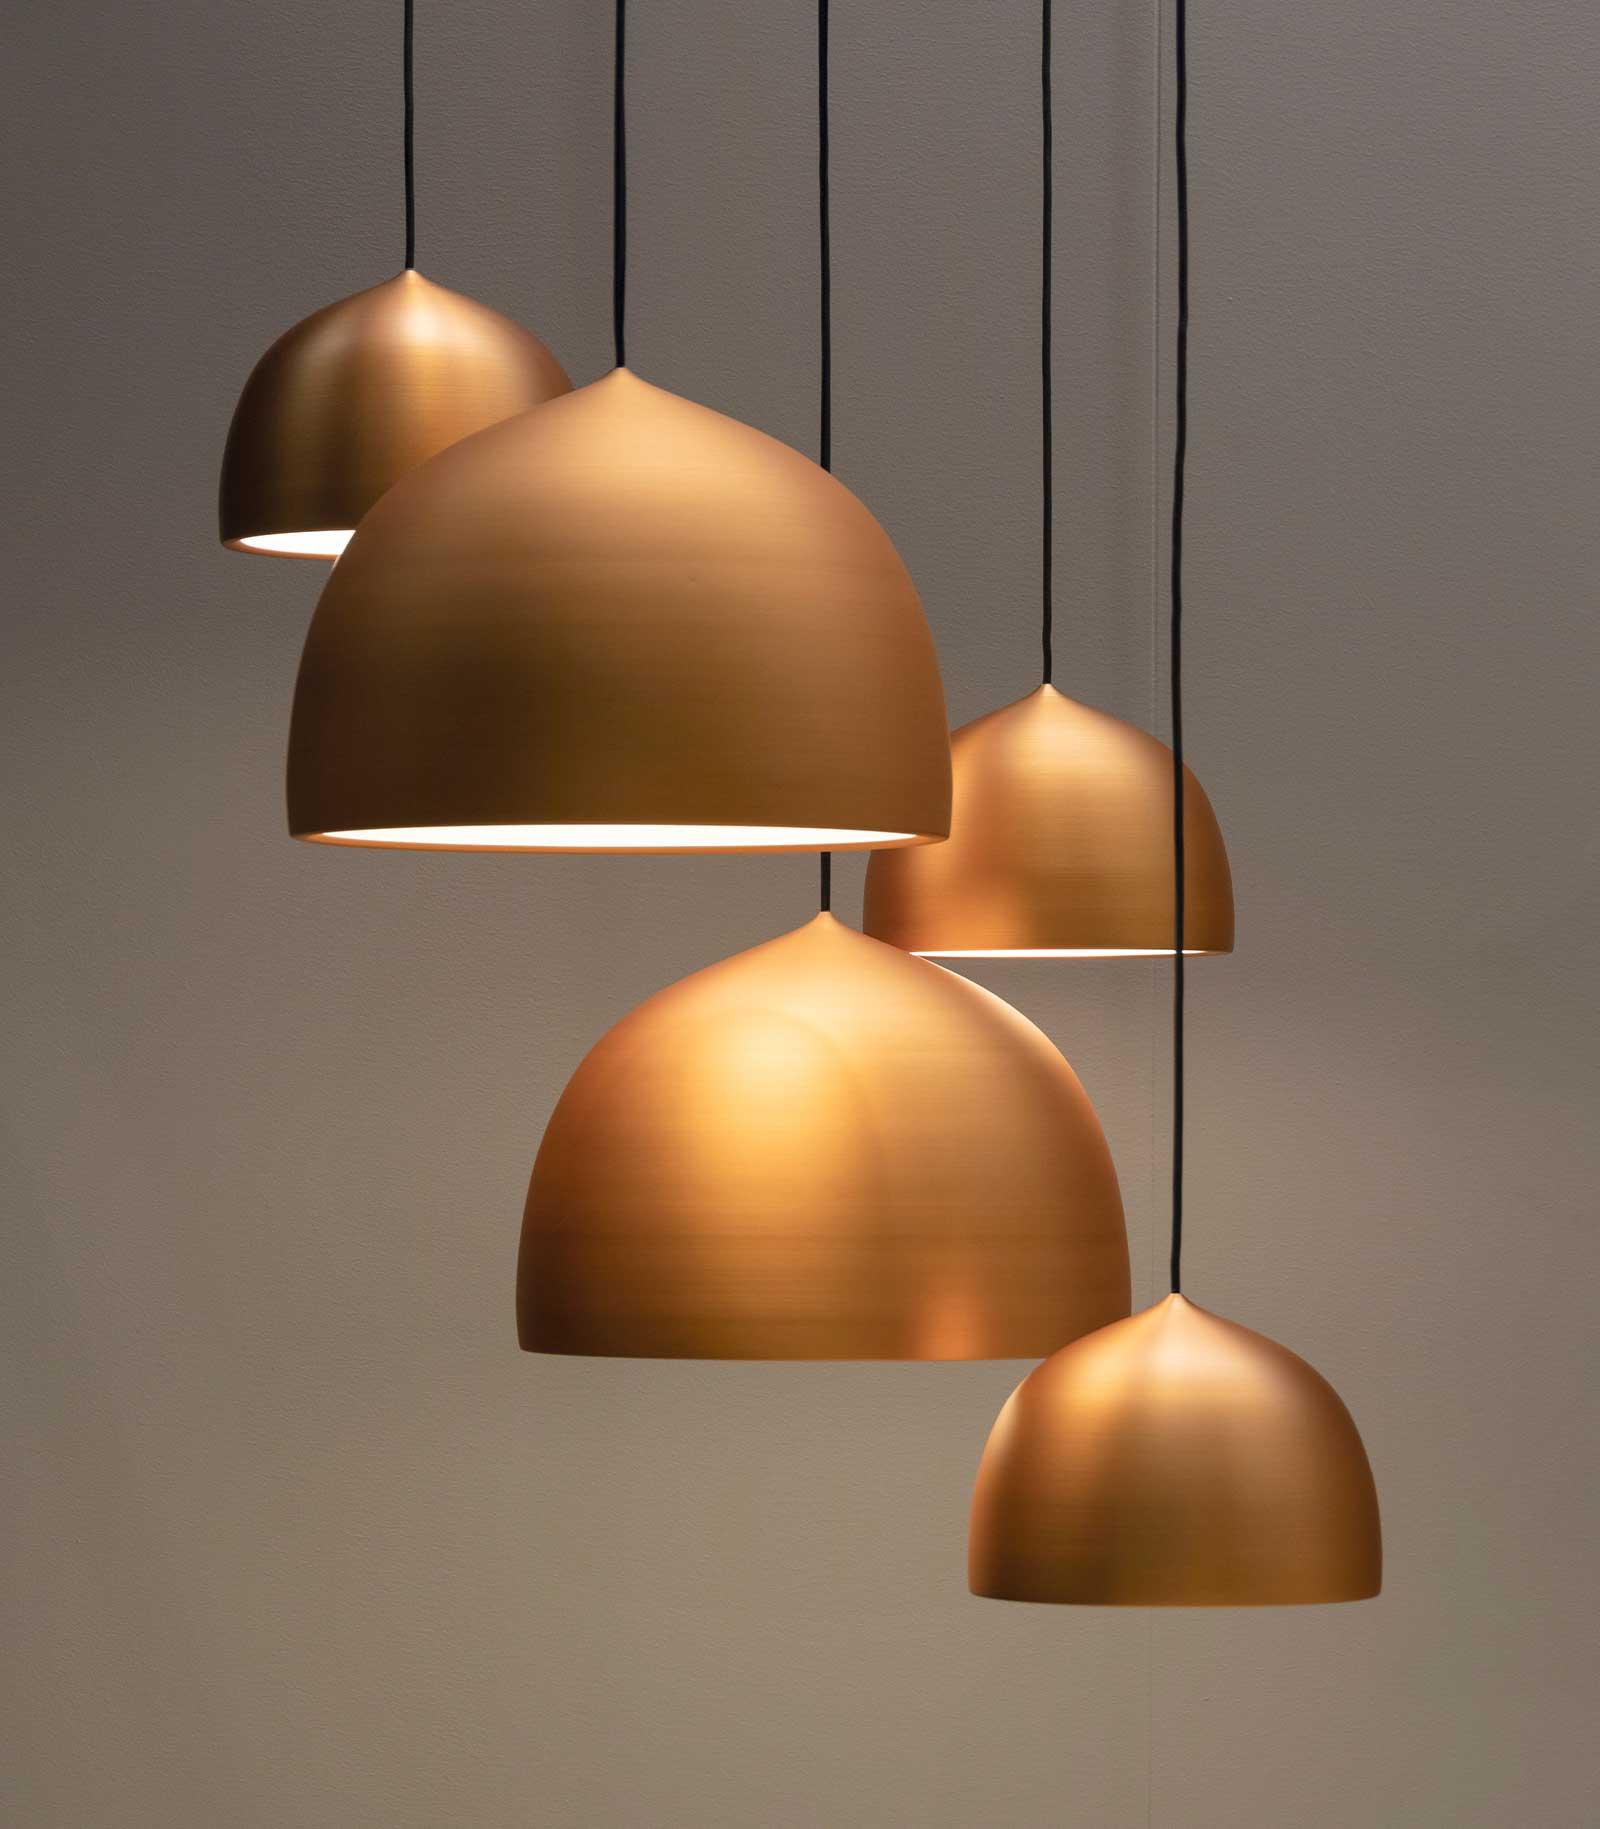 Golden Lamp